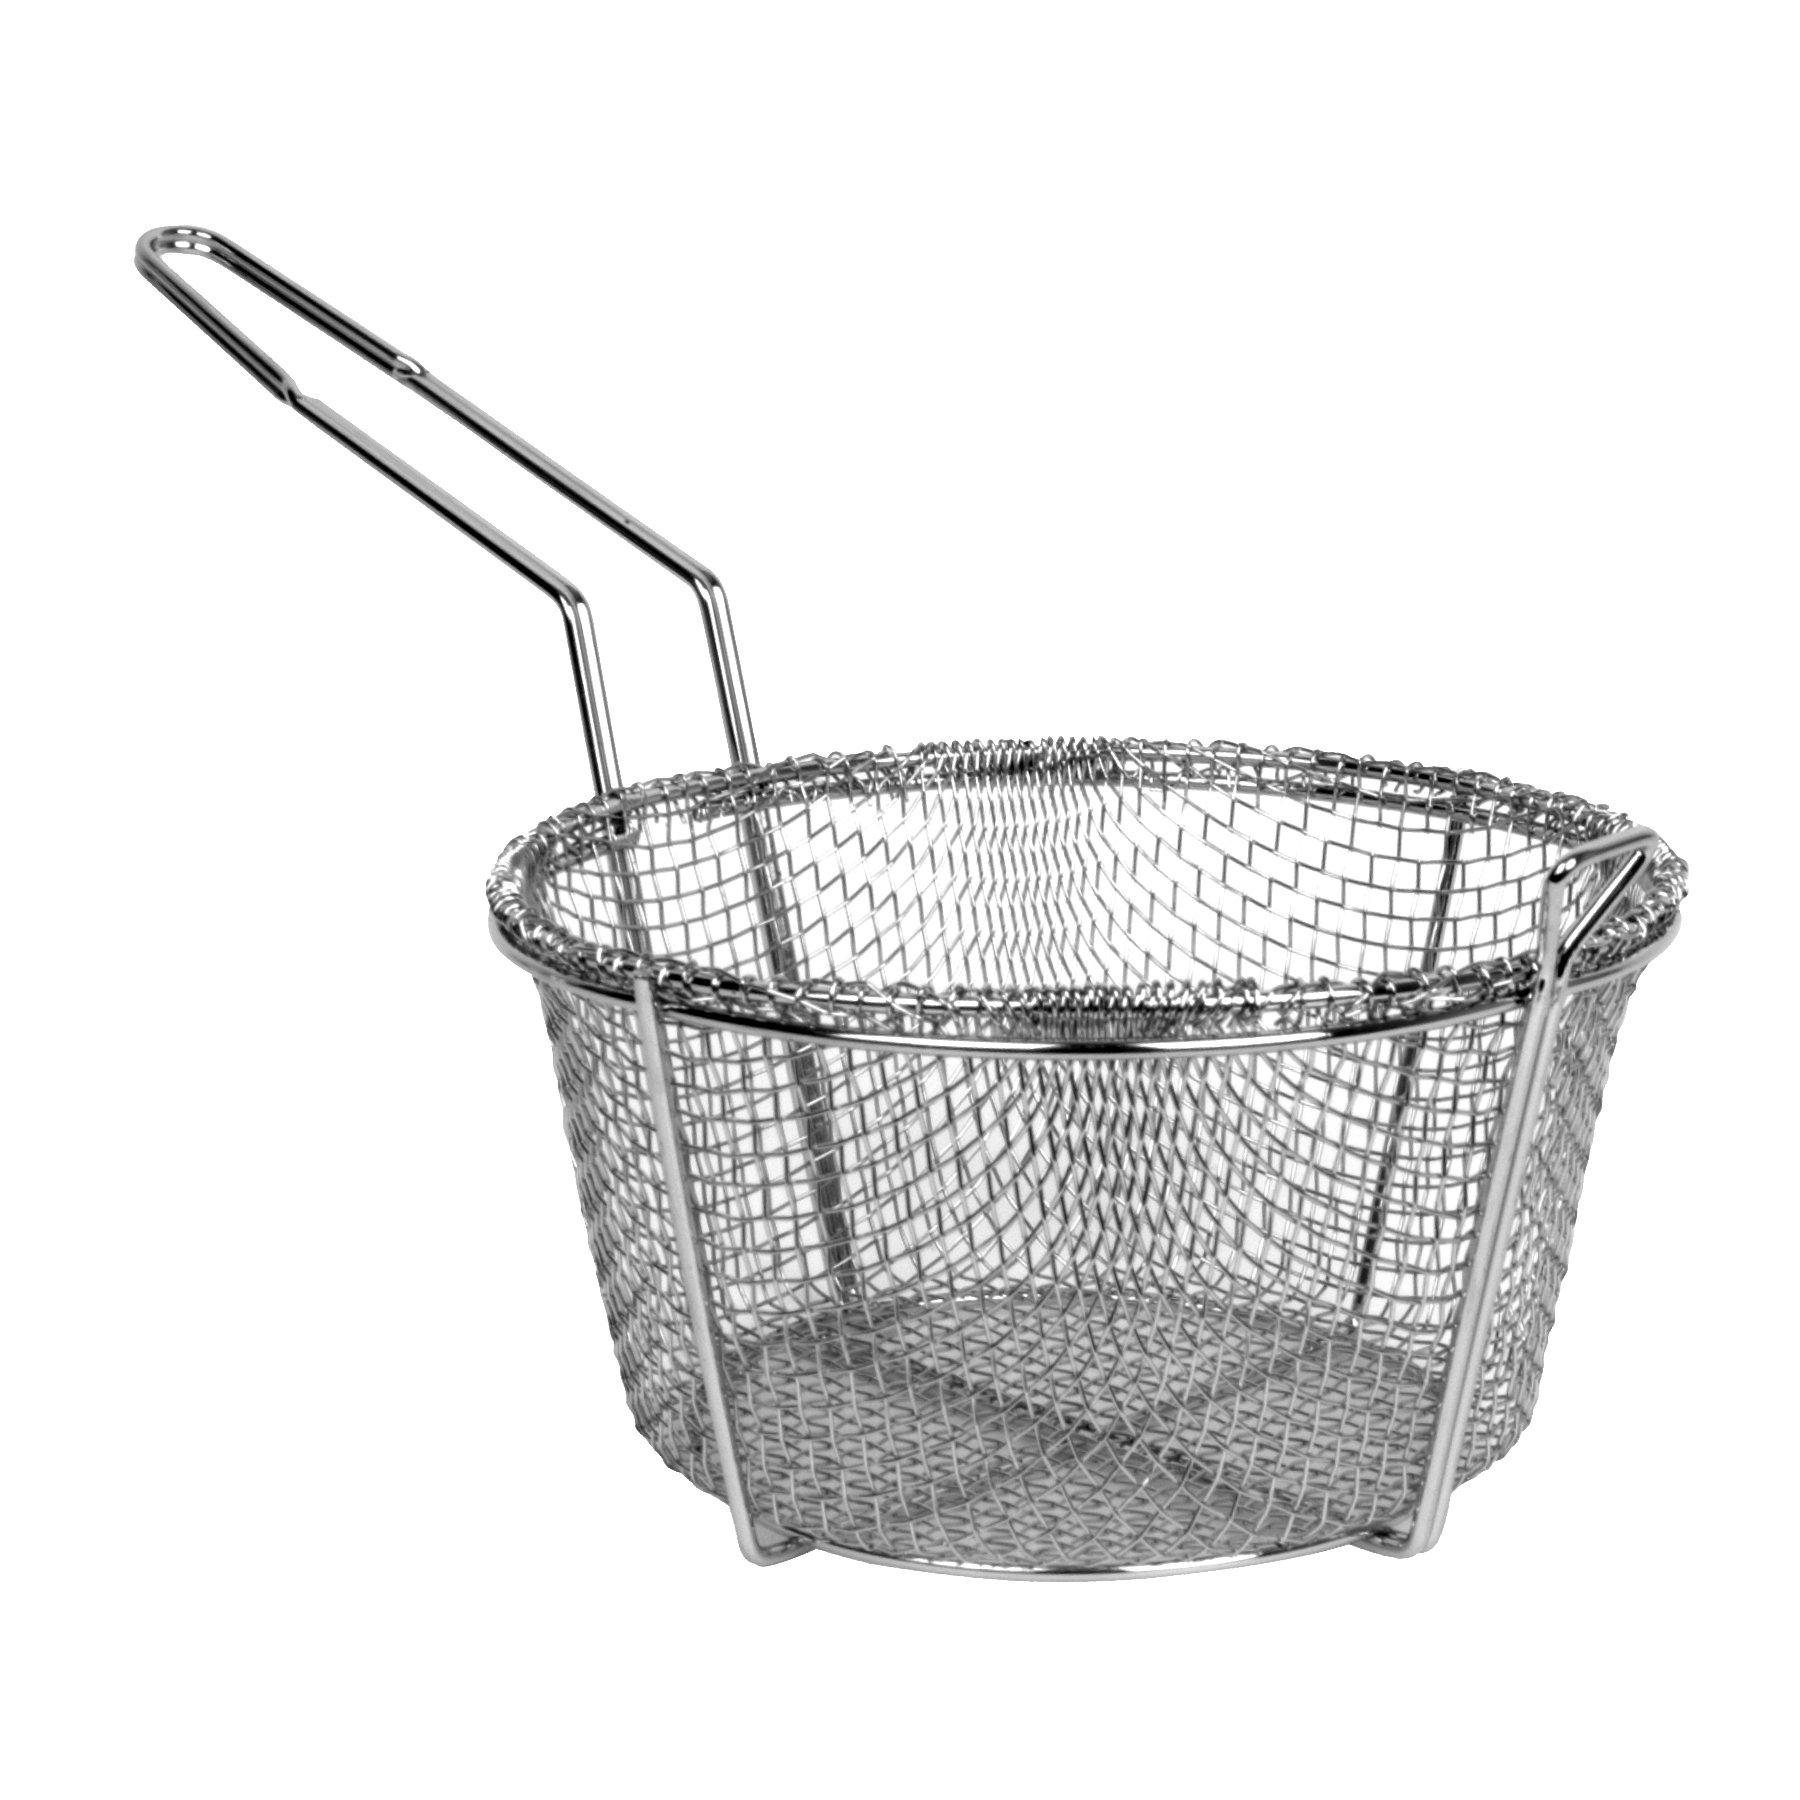 Thunder Group 9 Inch Fry Basket, Medium